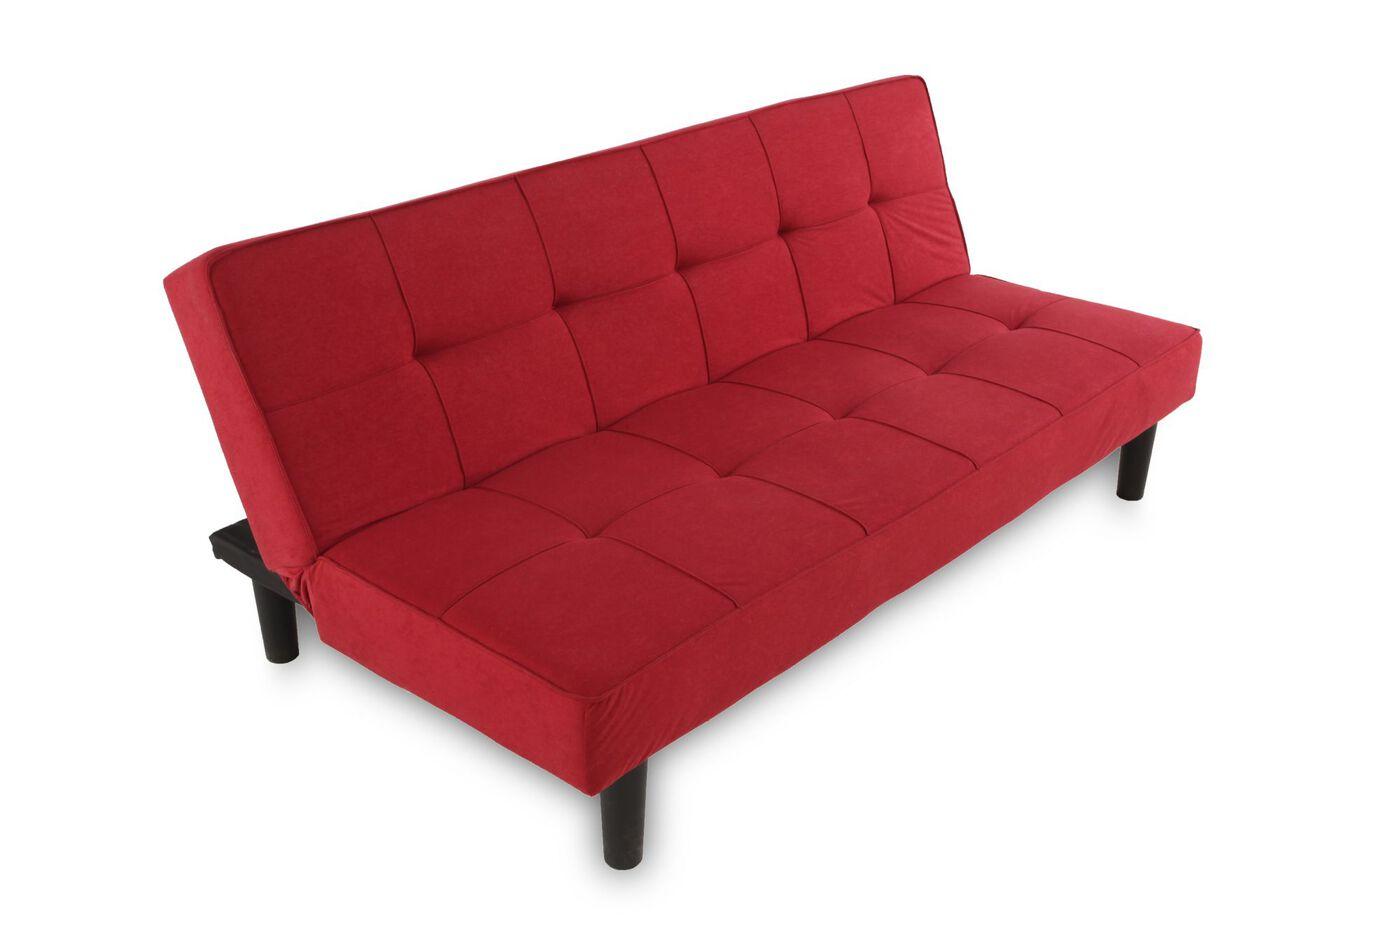 Flip Flop Chair Ashley Flip Flop Vara Red Converta Sofa Mathis Brothers Furniture